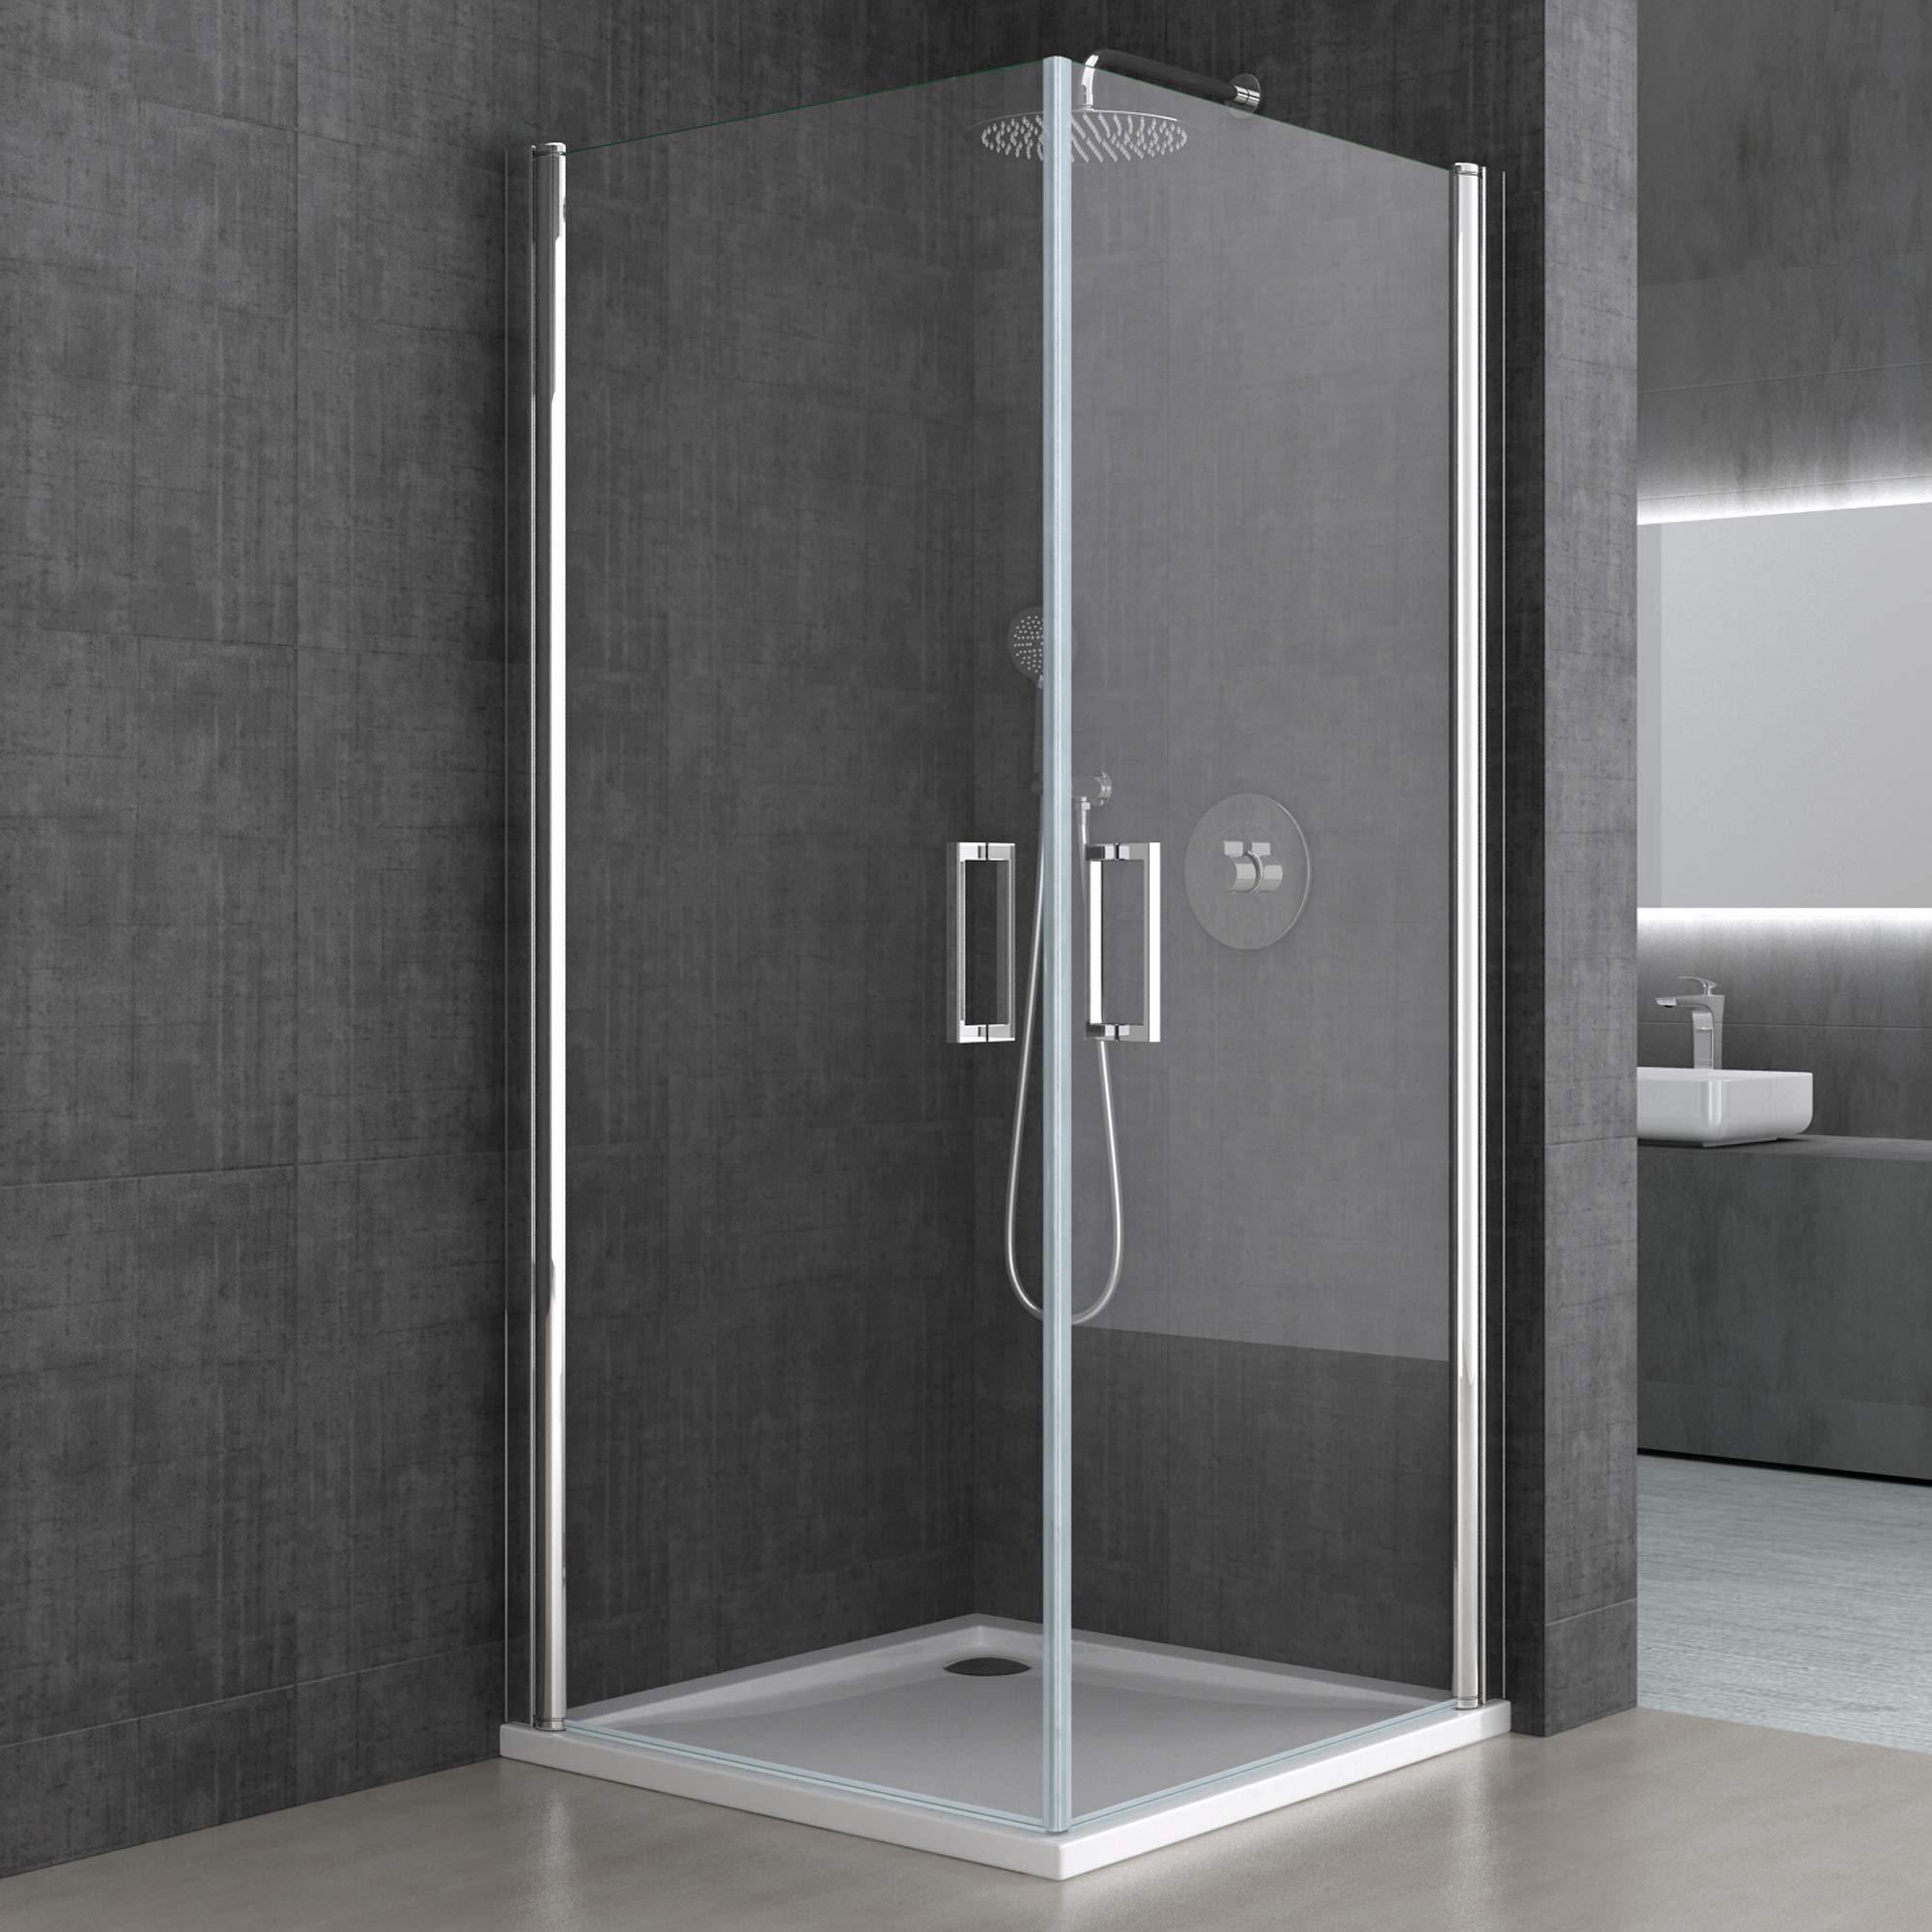 BTH: 70 x 85 x 190 cm Diseño Mampara ravenna22 con doble puerta ...